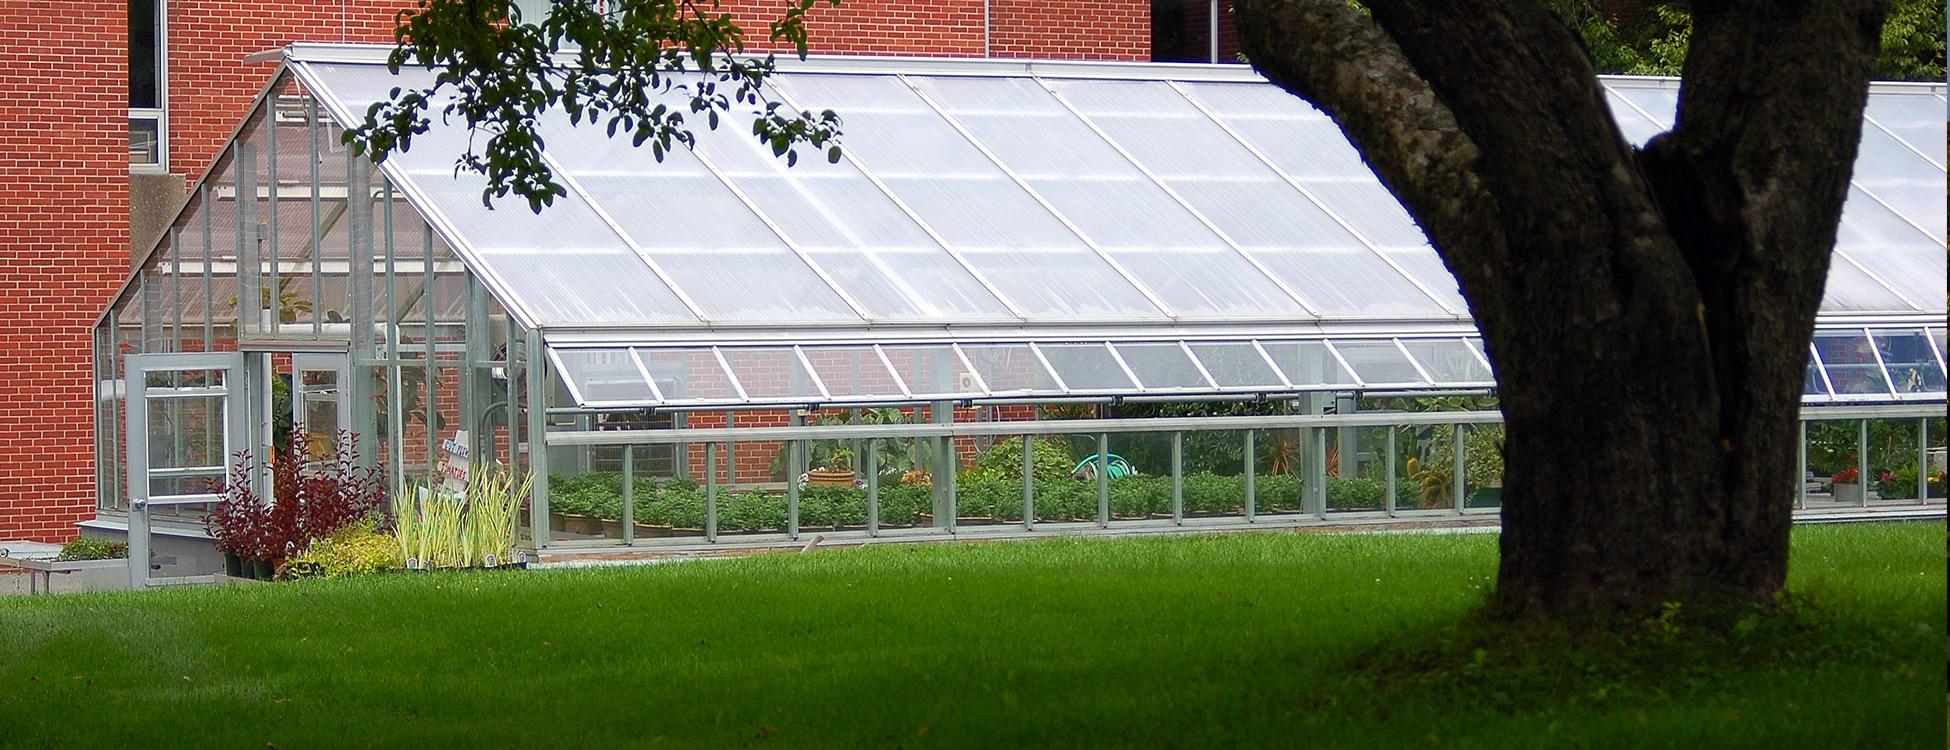 greenhouse, Randolph Center campus, landscape contracting, flowers, plants